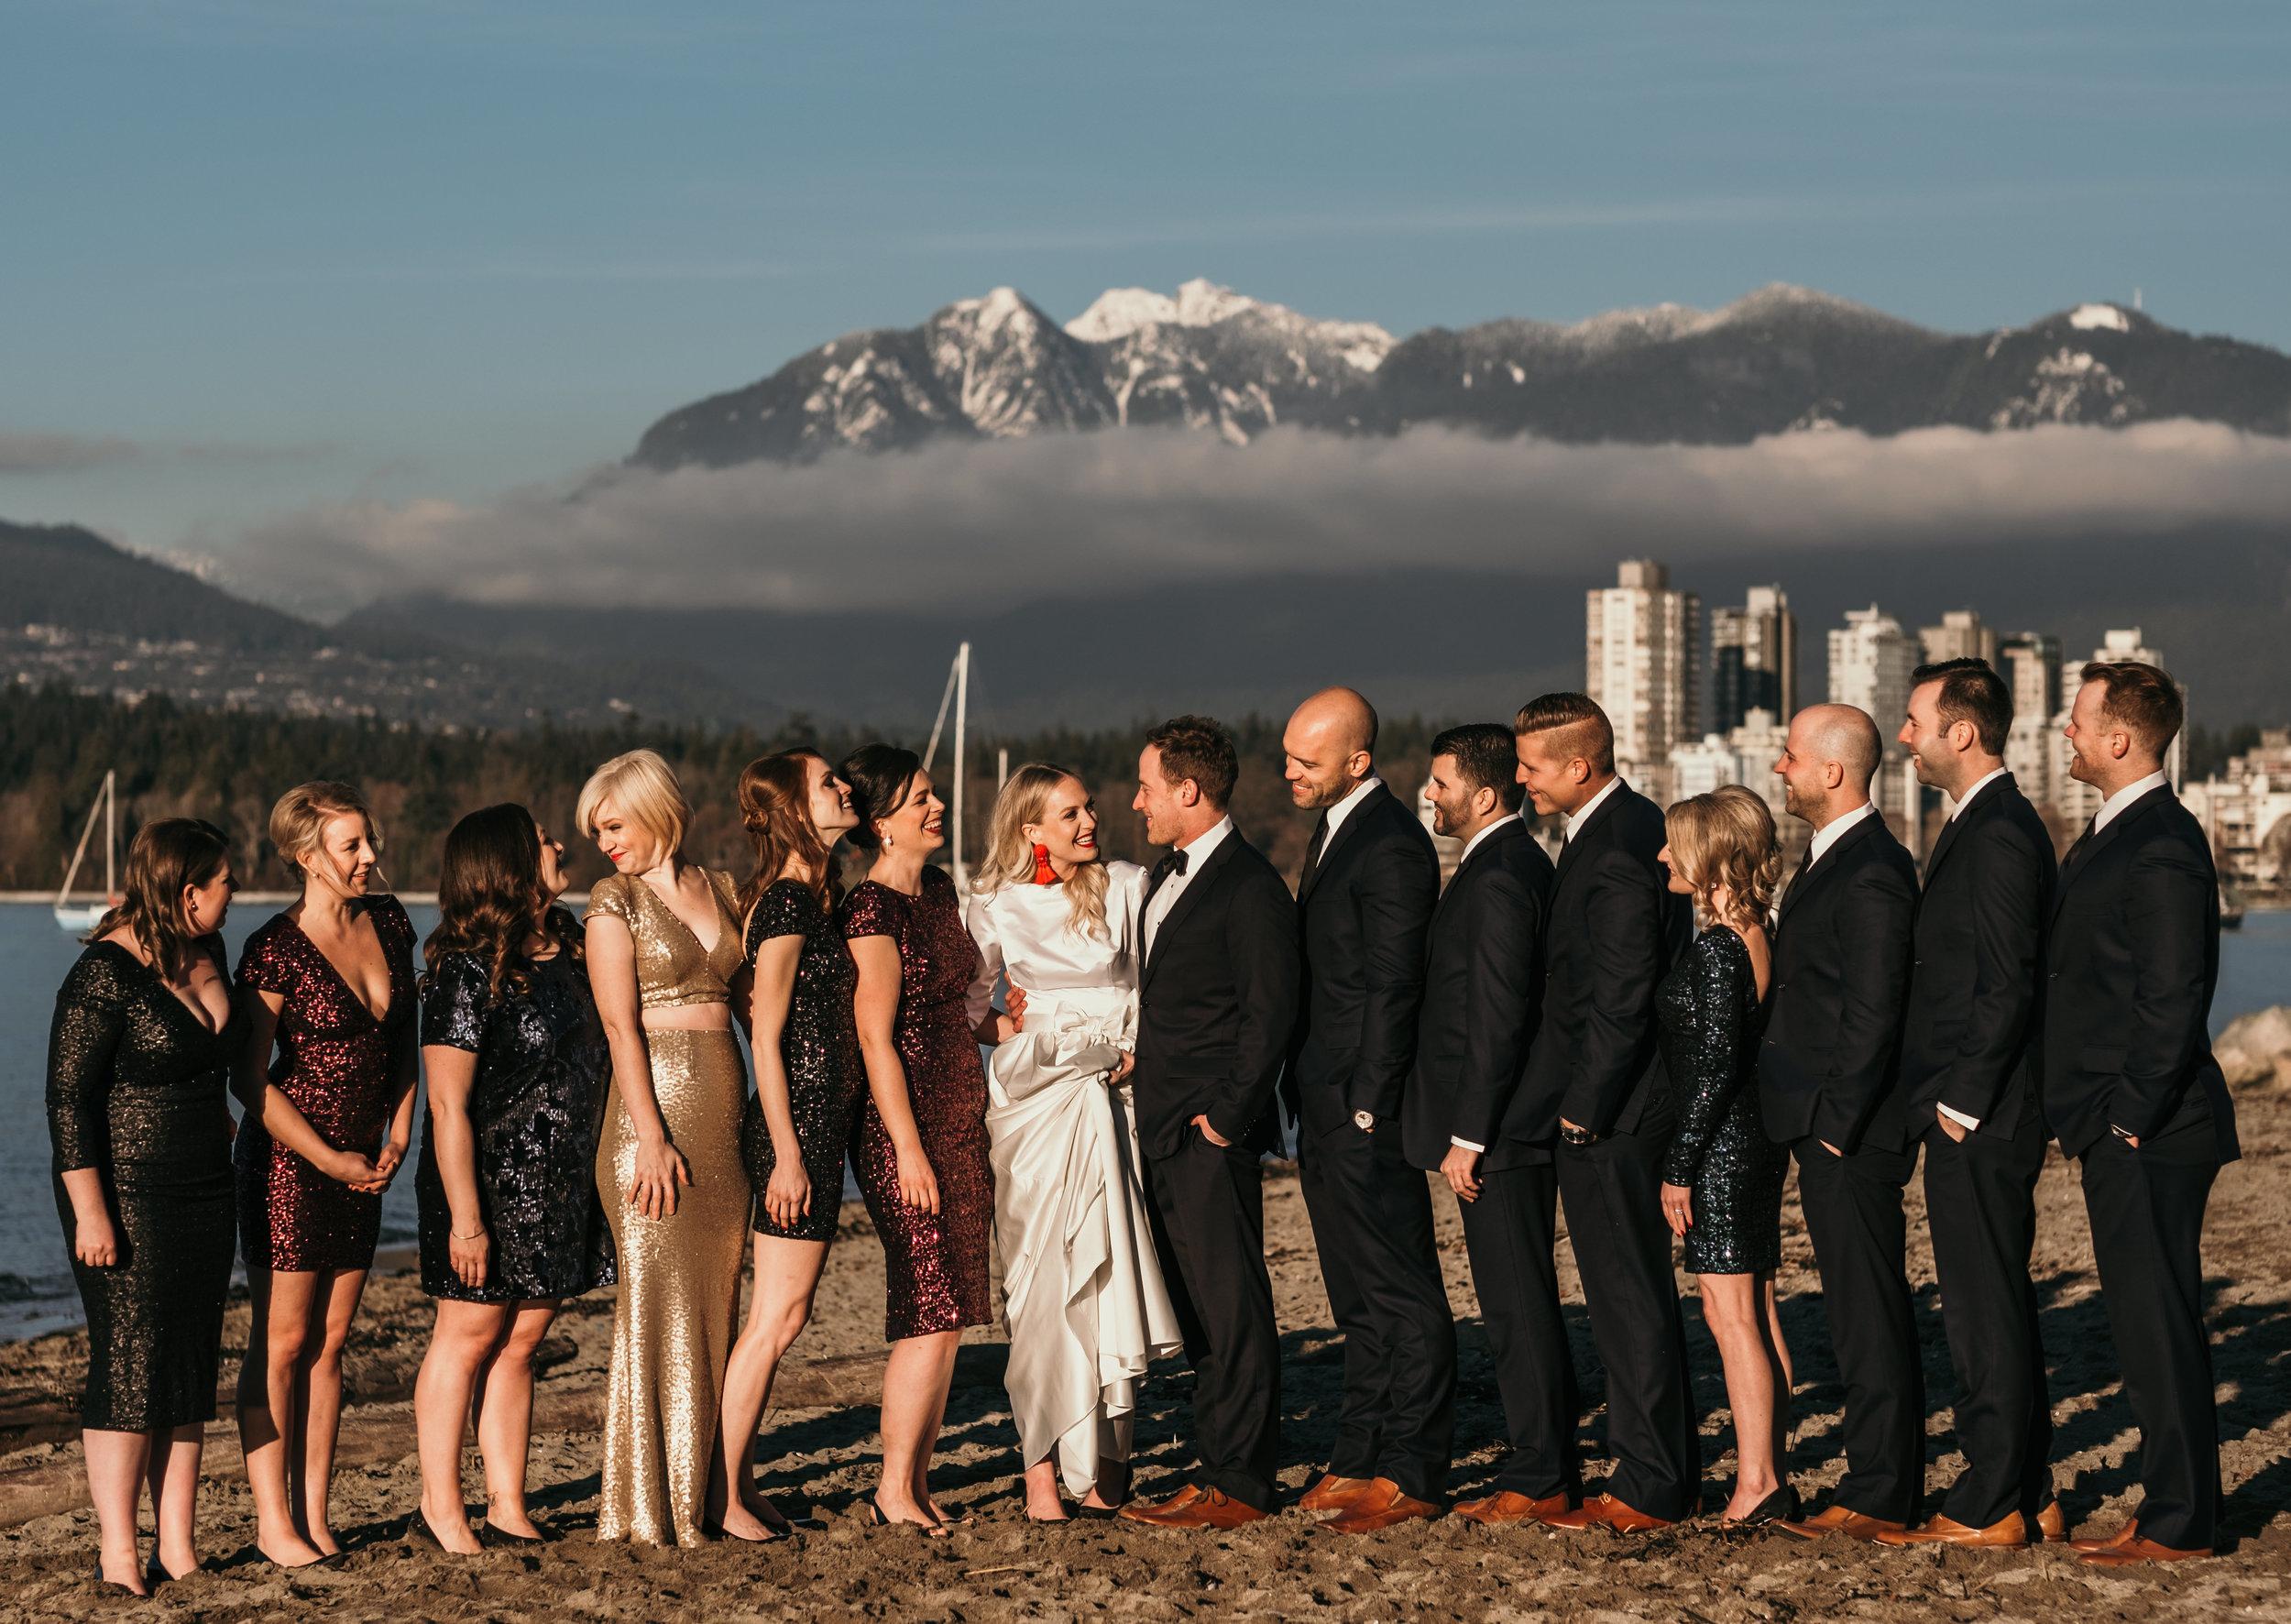 Vancouver Wedding Photos - Vegan Wedding Photographer - New Years Eve Wedding Photos - Vancouver Wedding Photographer - Vancouver Wedding Videographer - 544.JPG